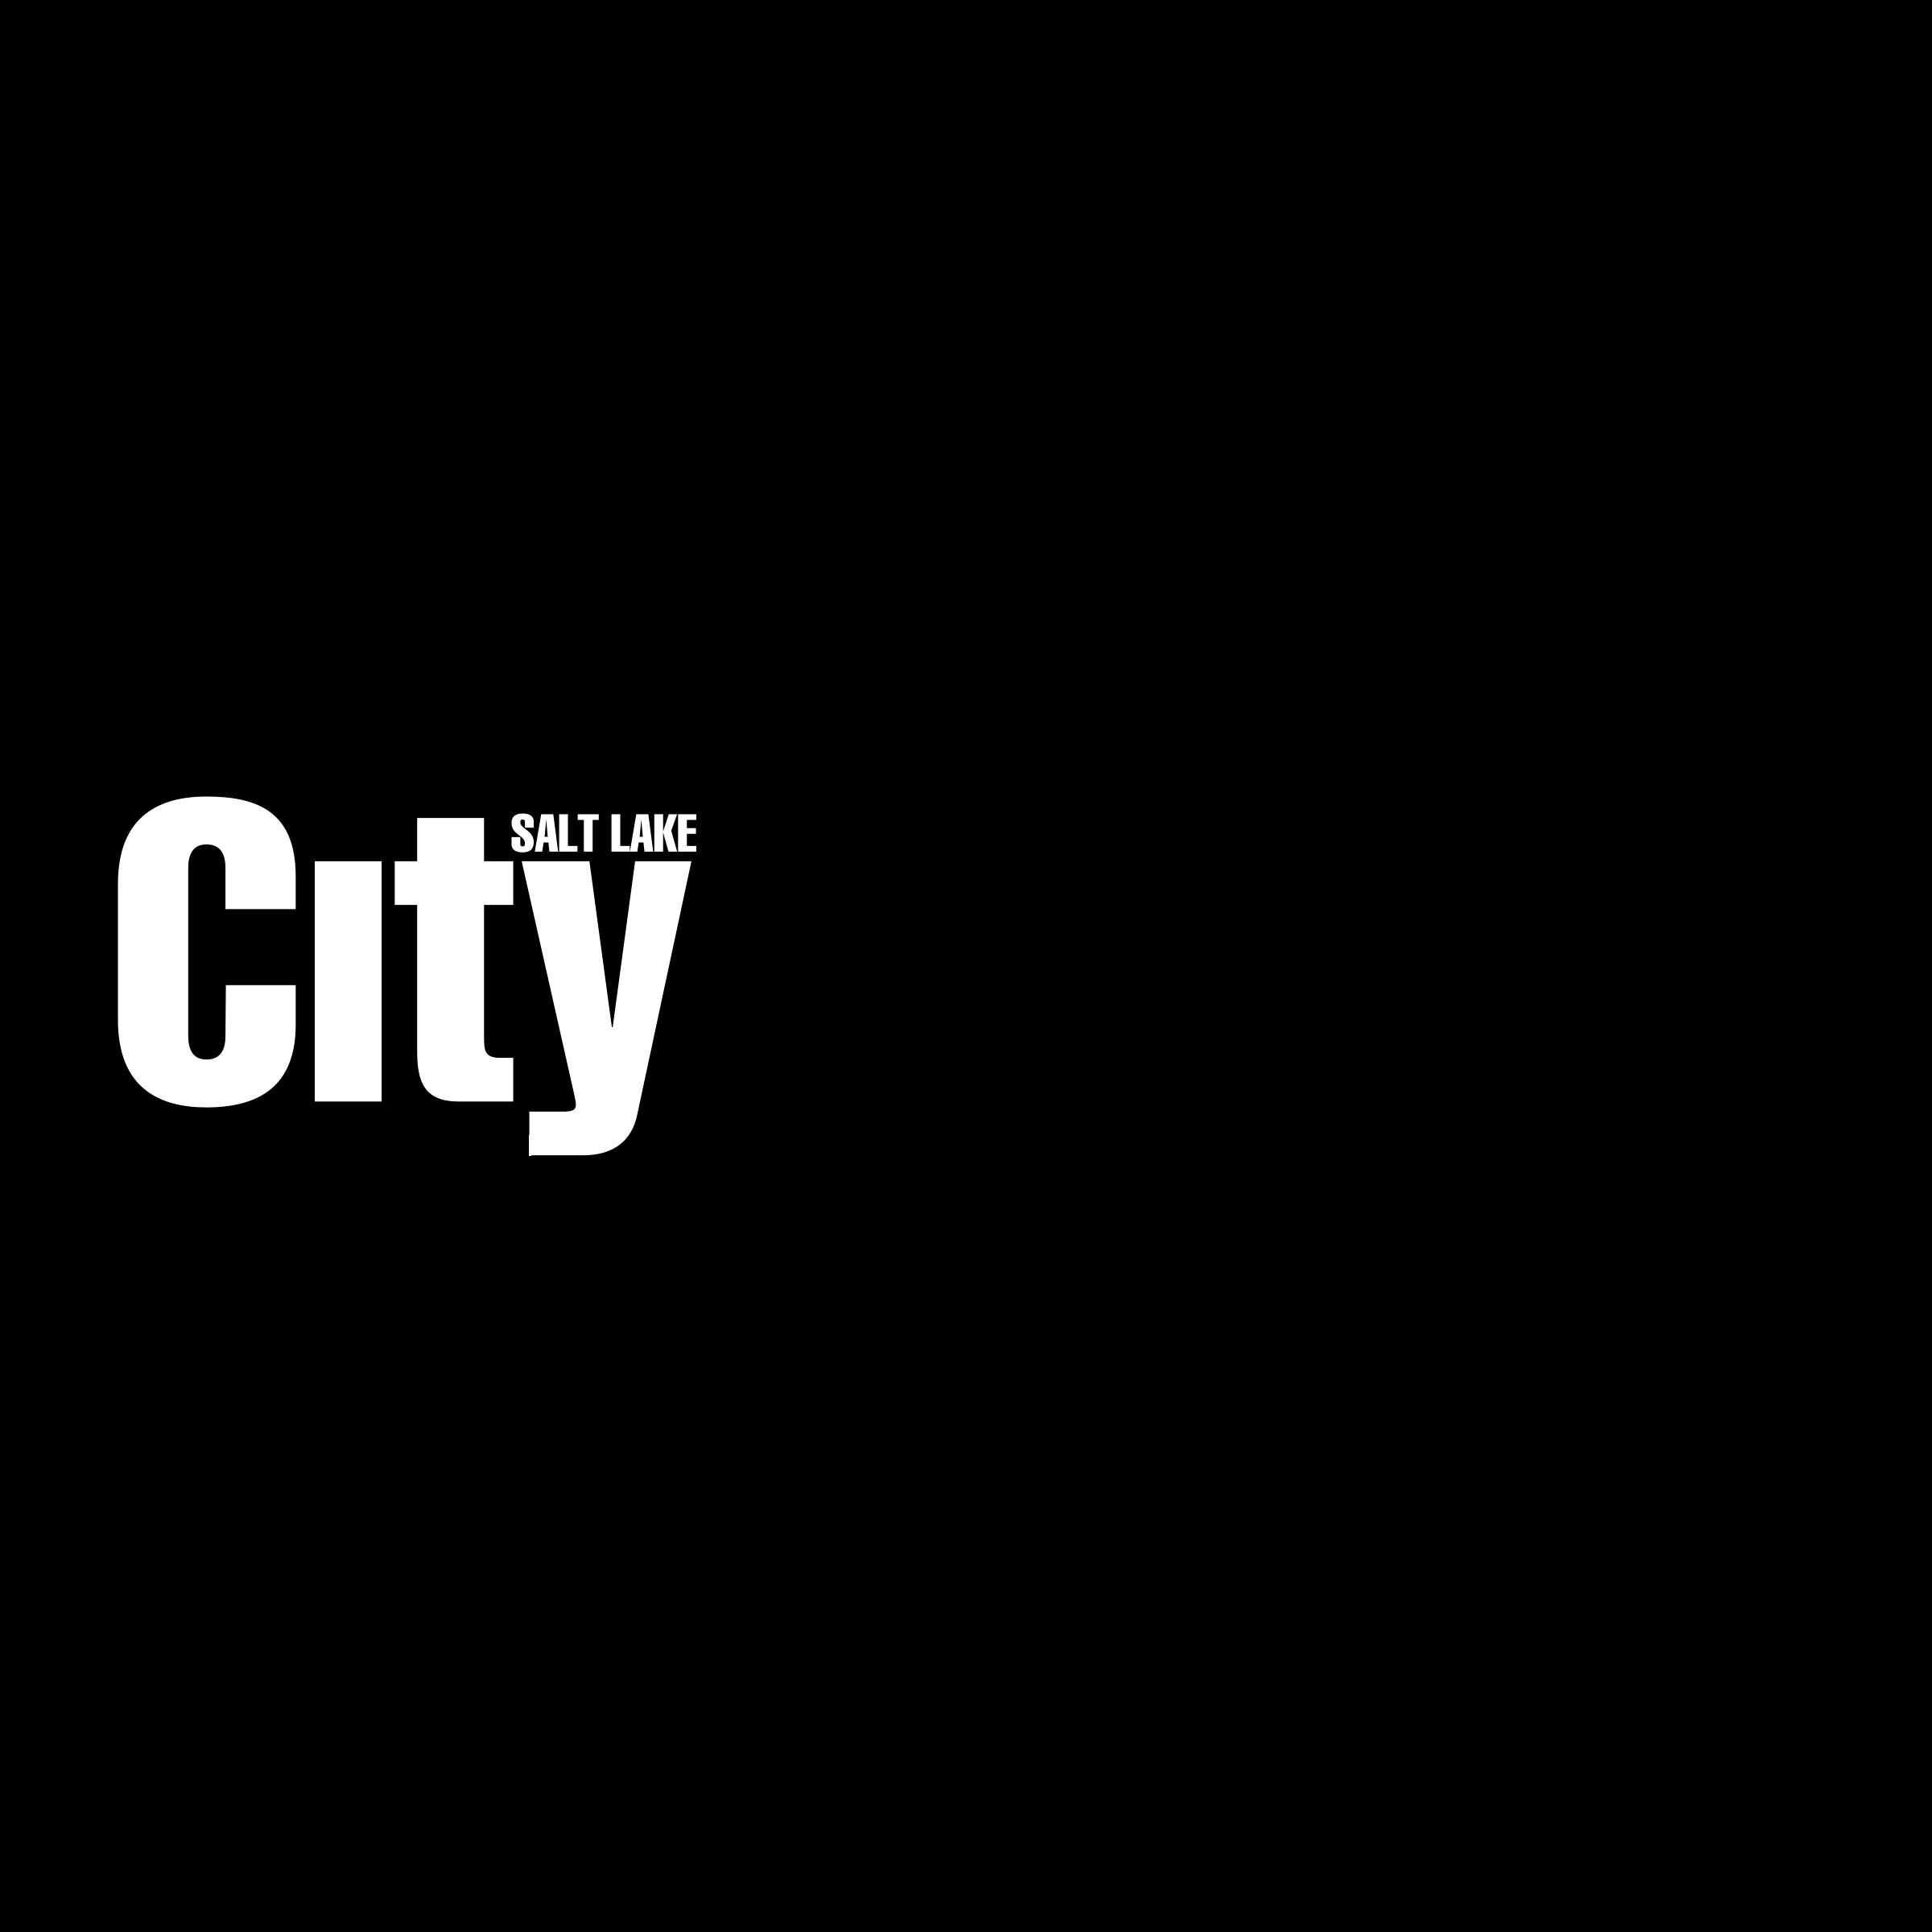 salt-lake-city-weekly-logo-png-transparent.png